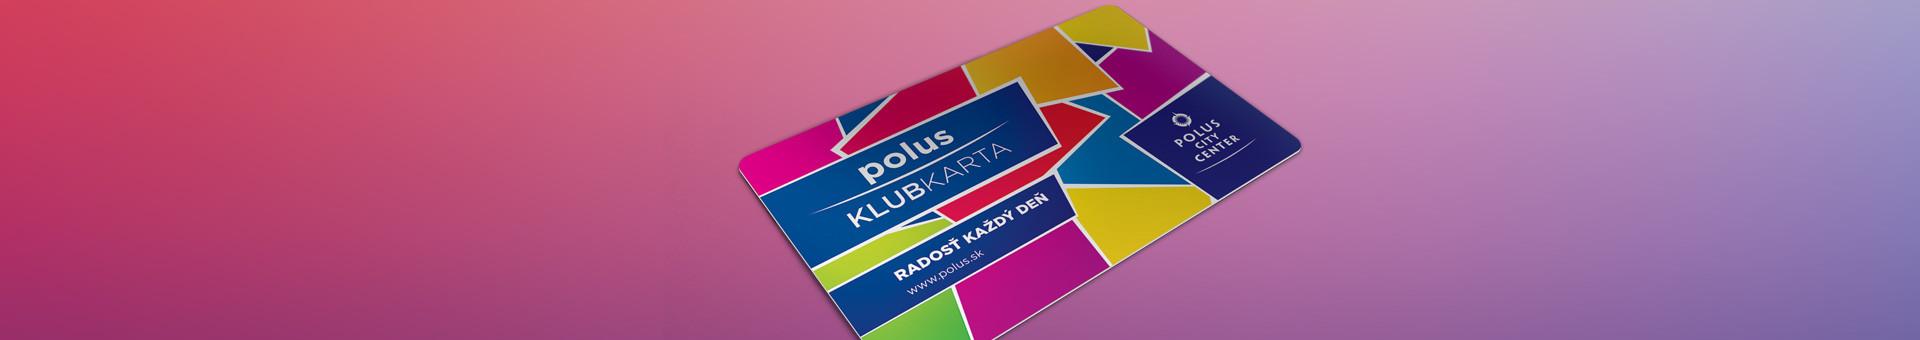 f2162c2b5 Polus club | Polus City Center